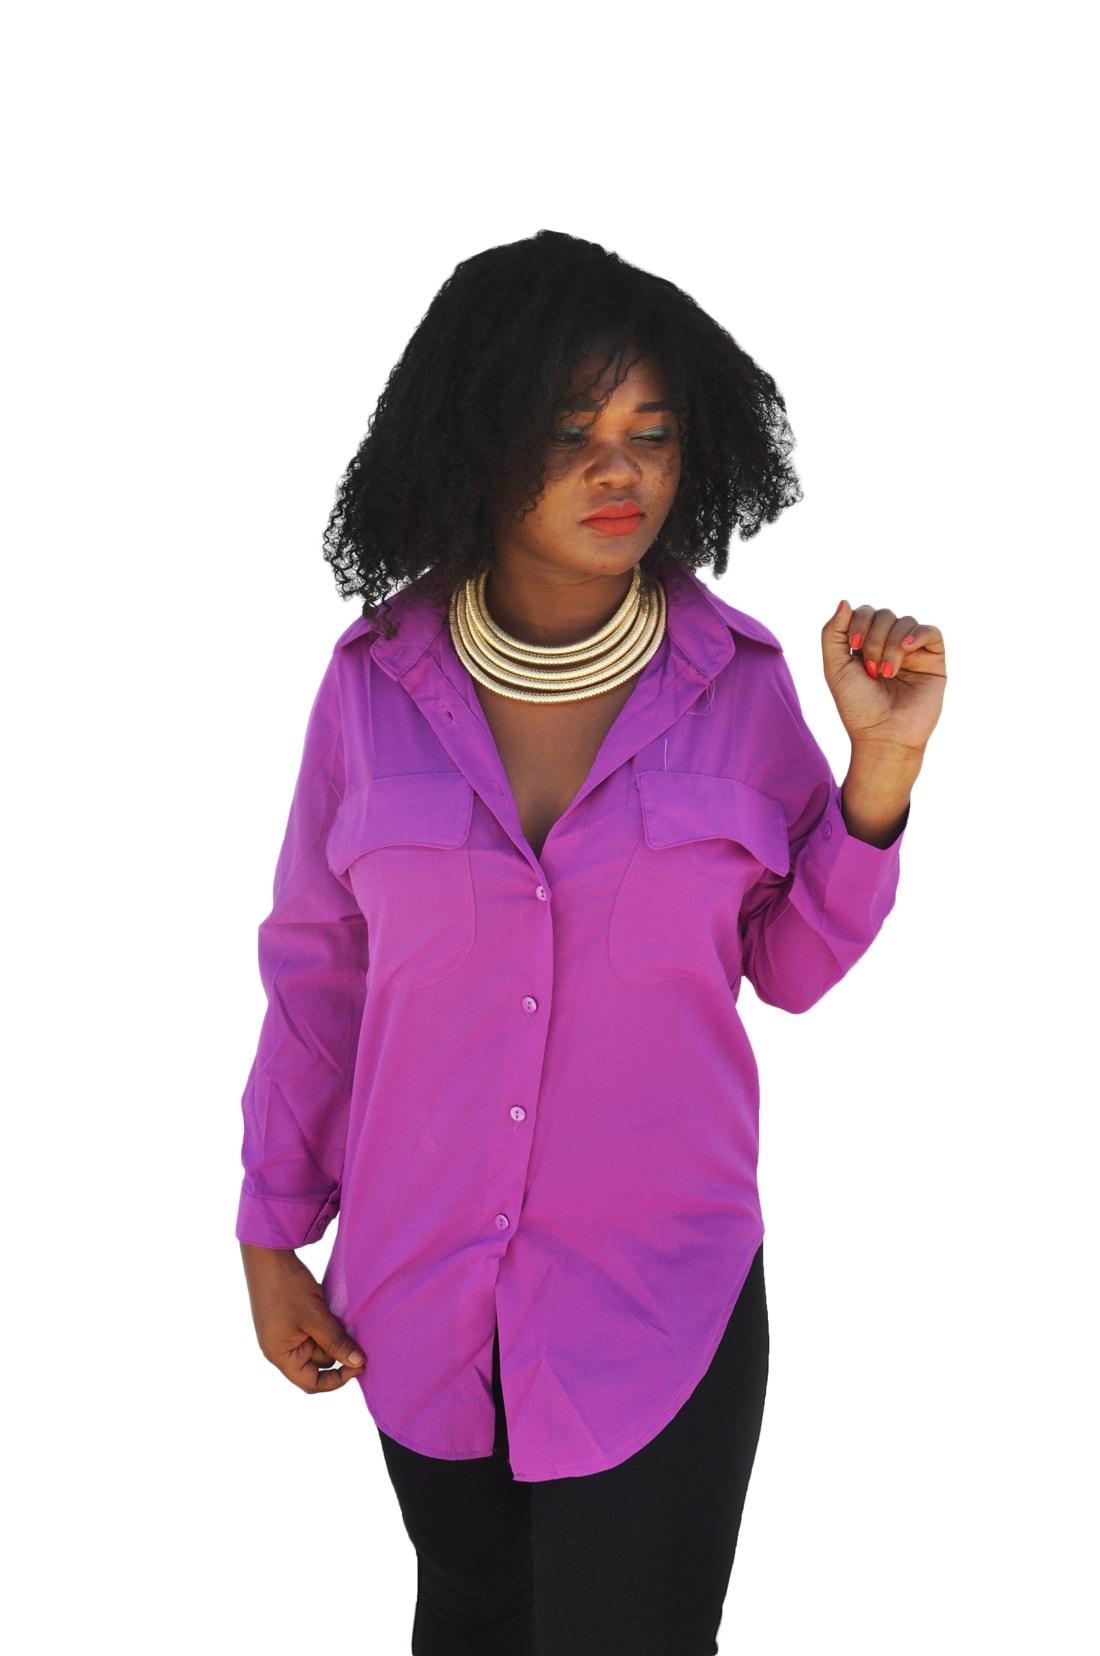 M0224 purple1 Long Sleeve Tops Shirts maureens.com boutique